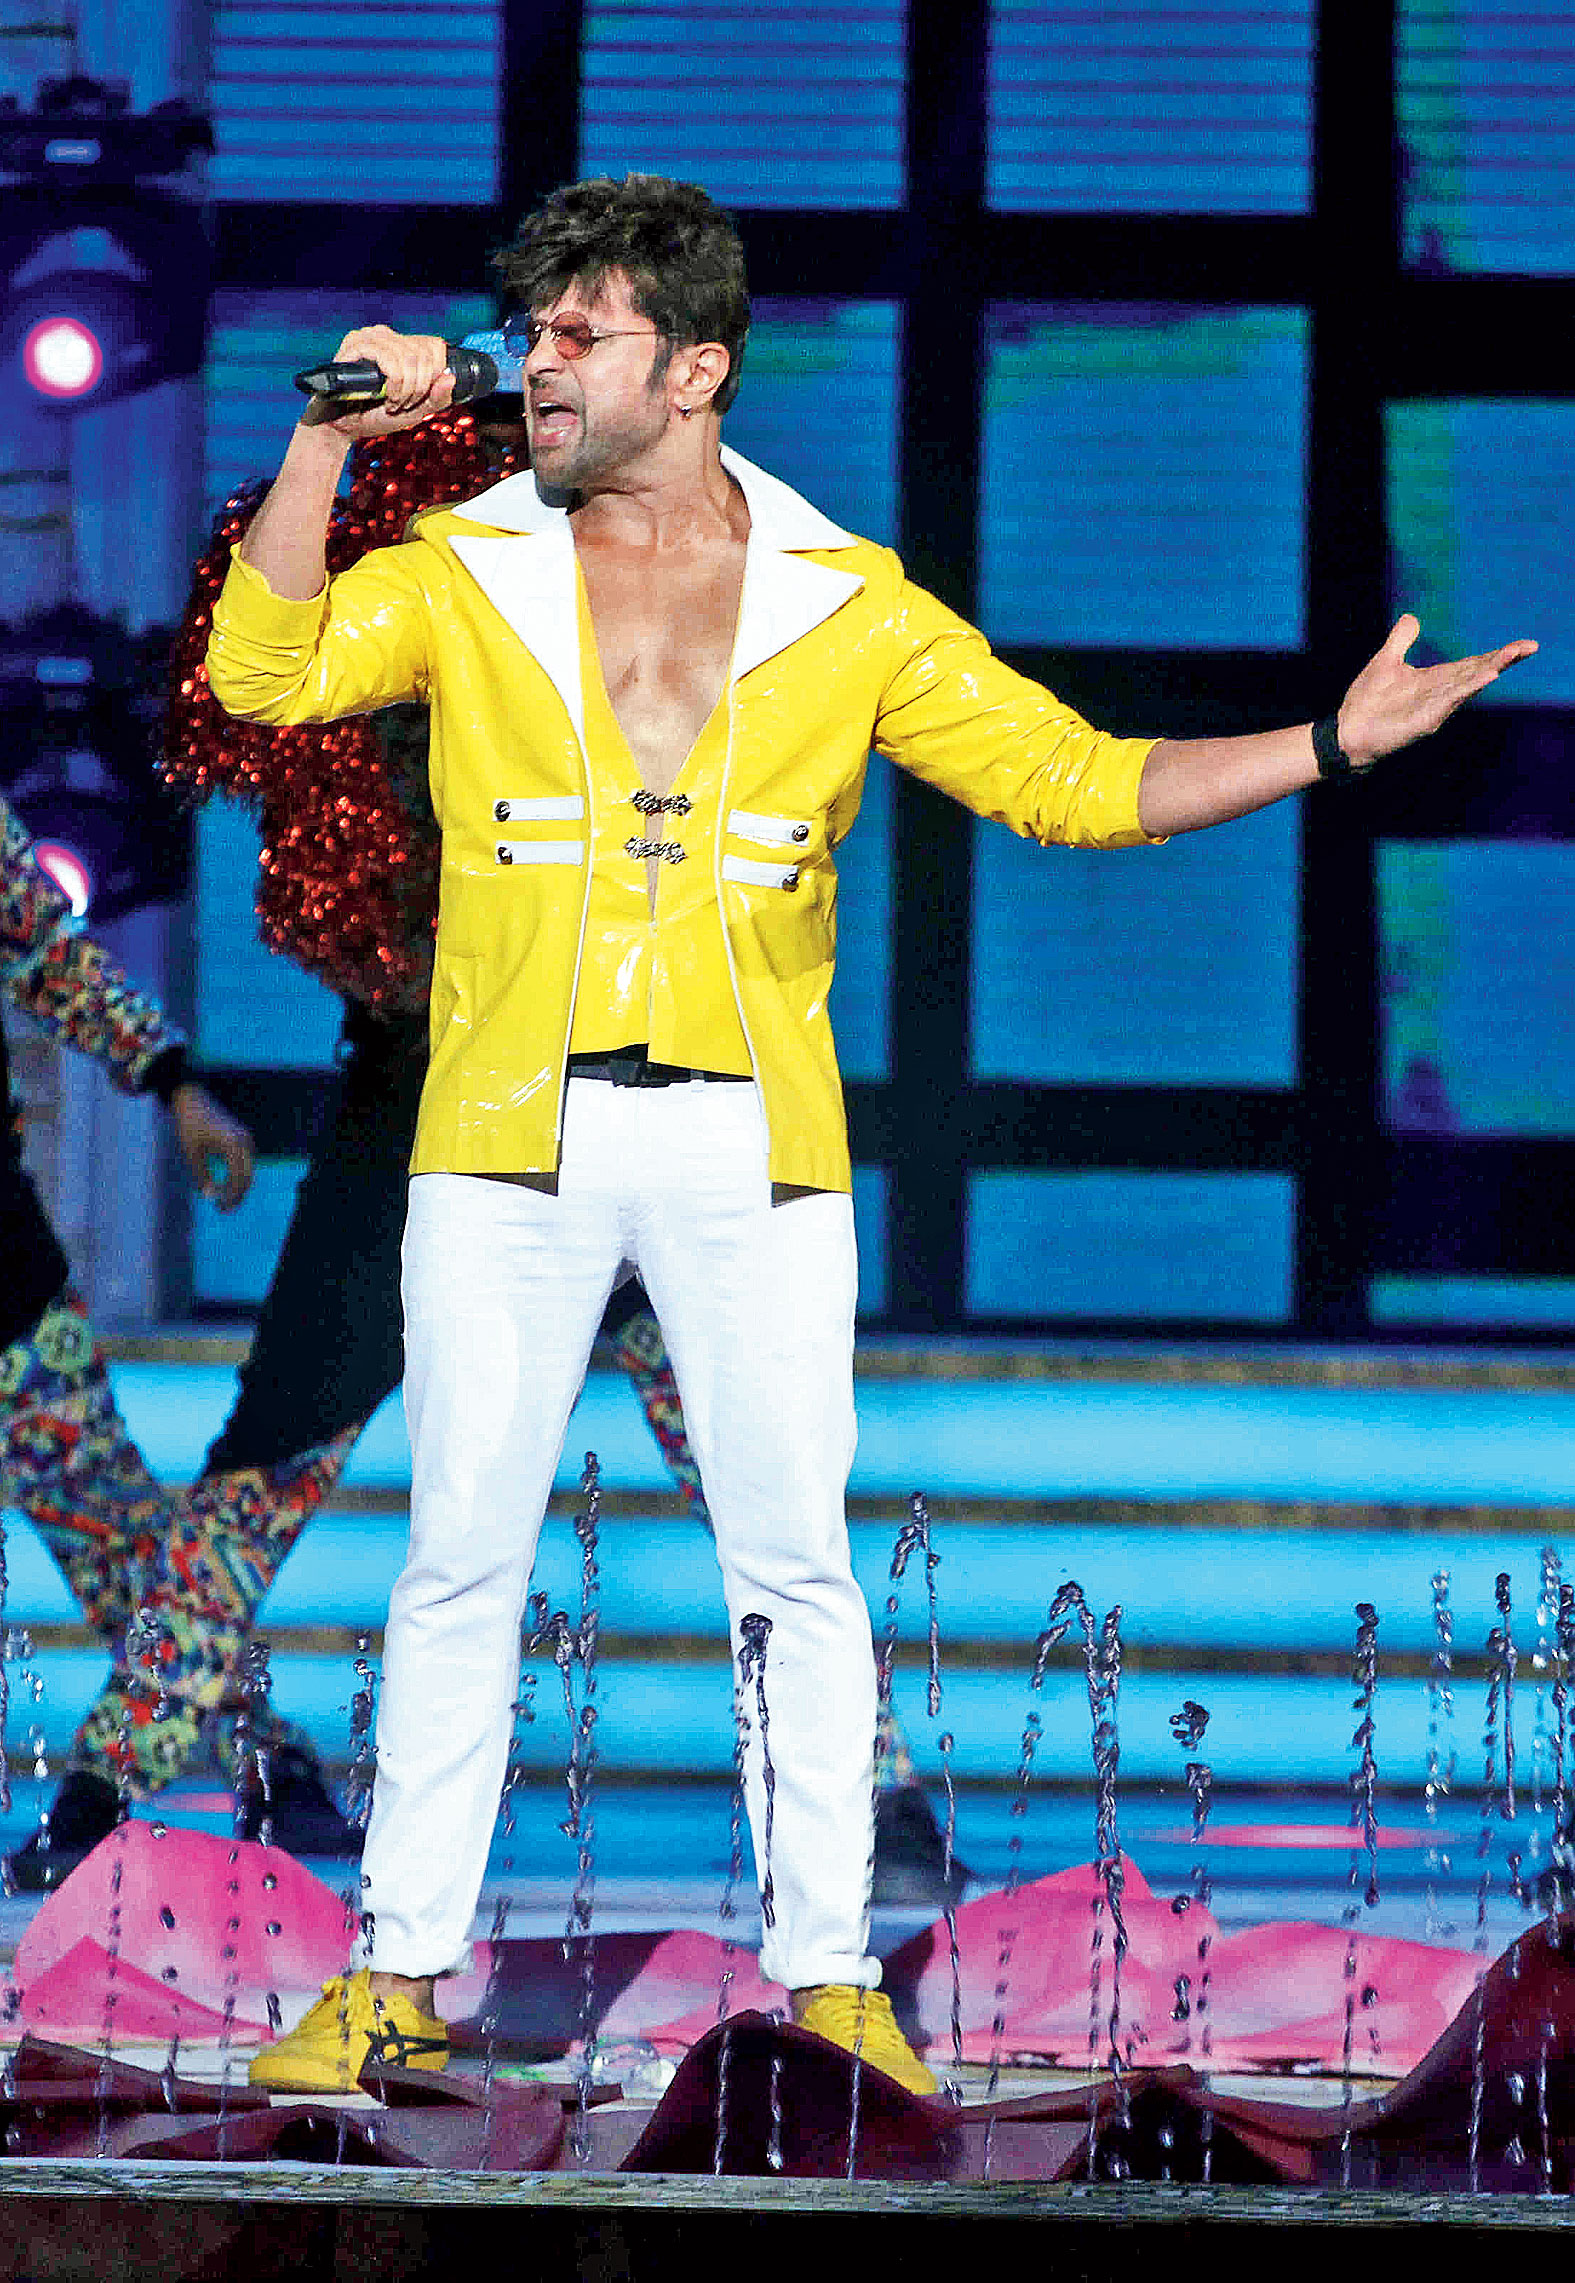 Himesh Reshammiya on song